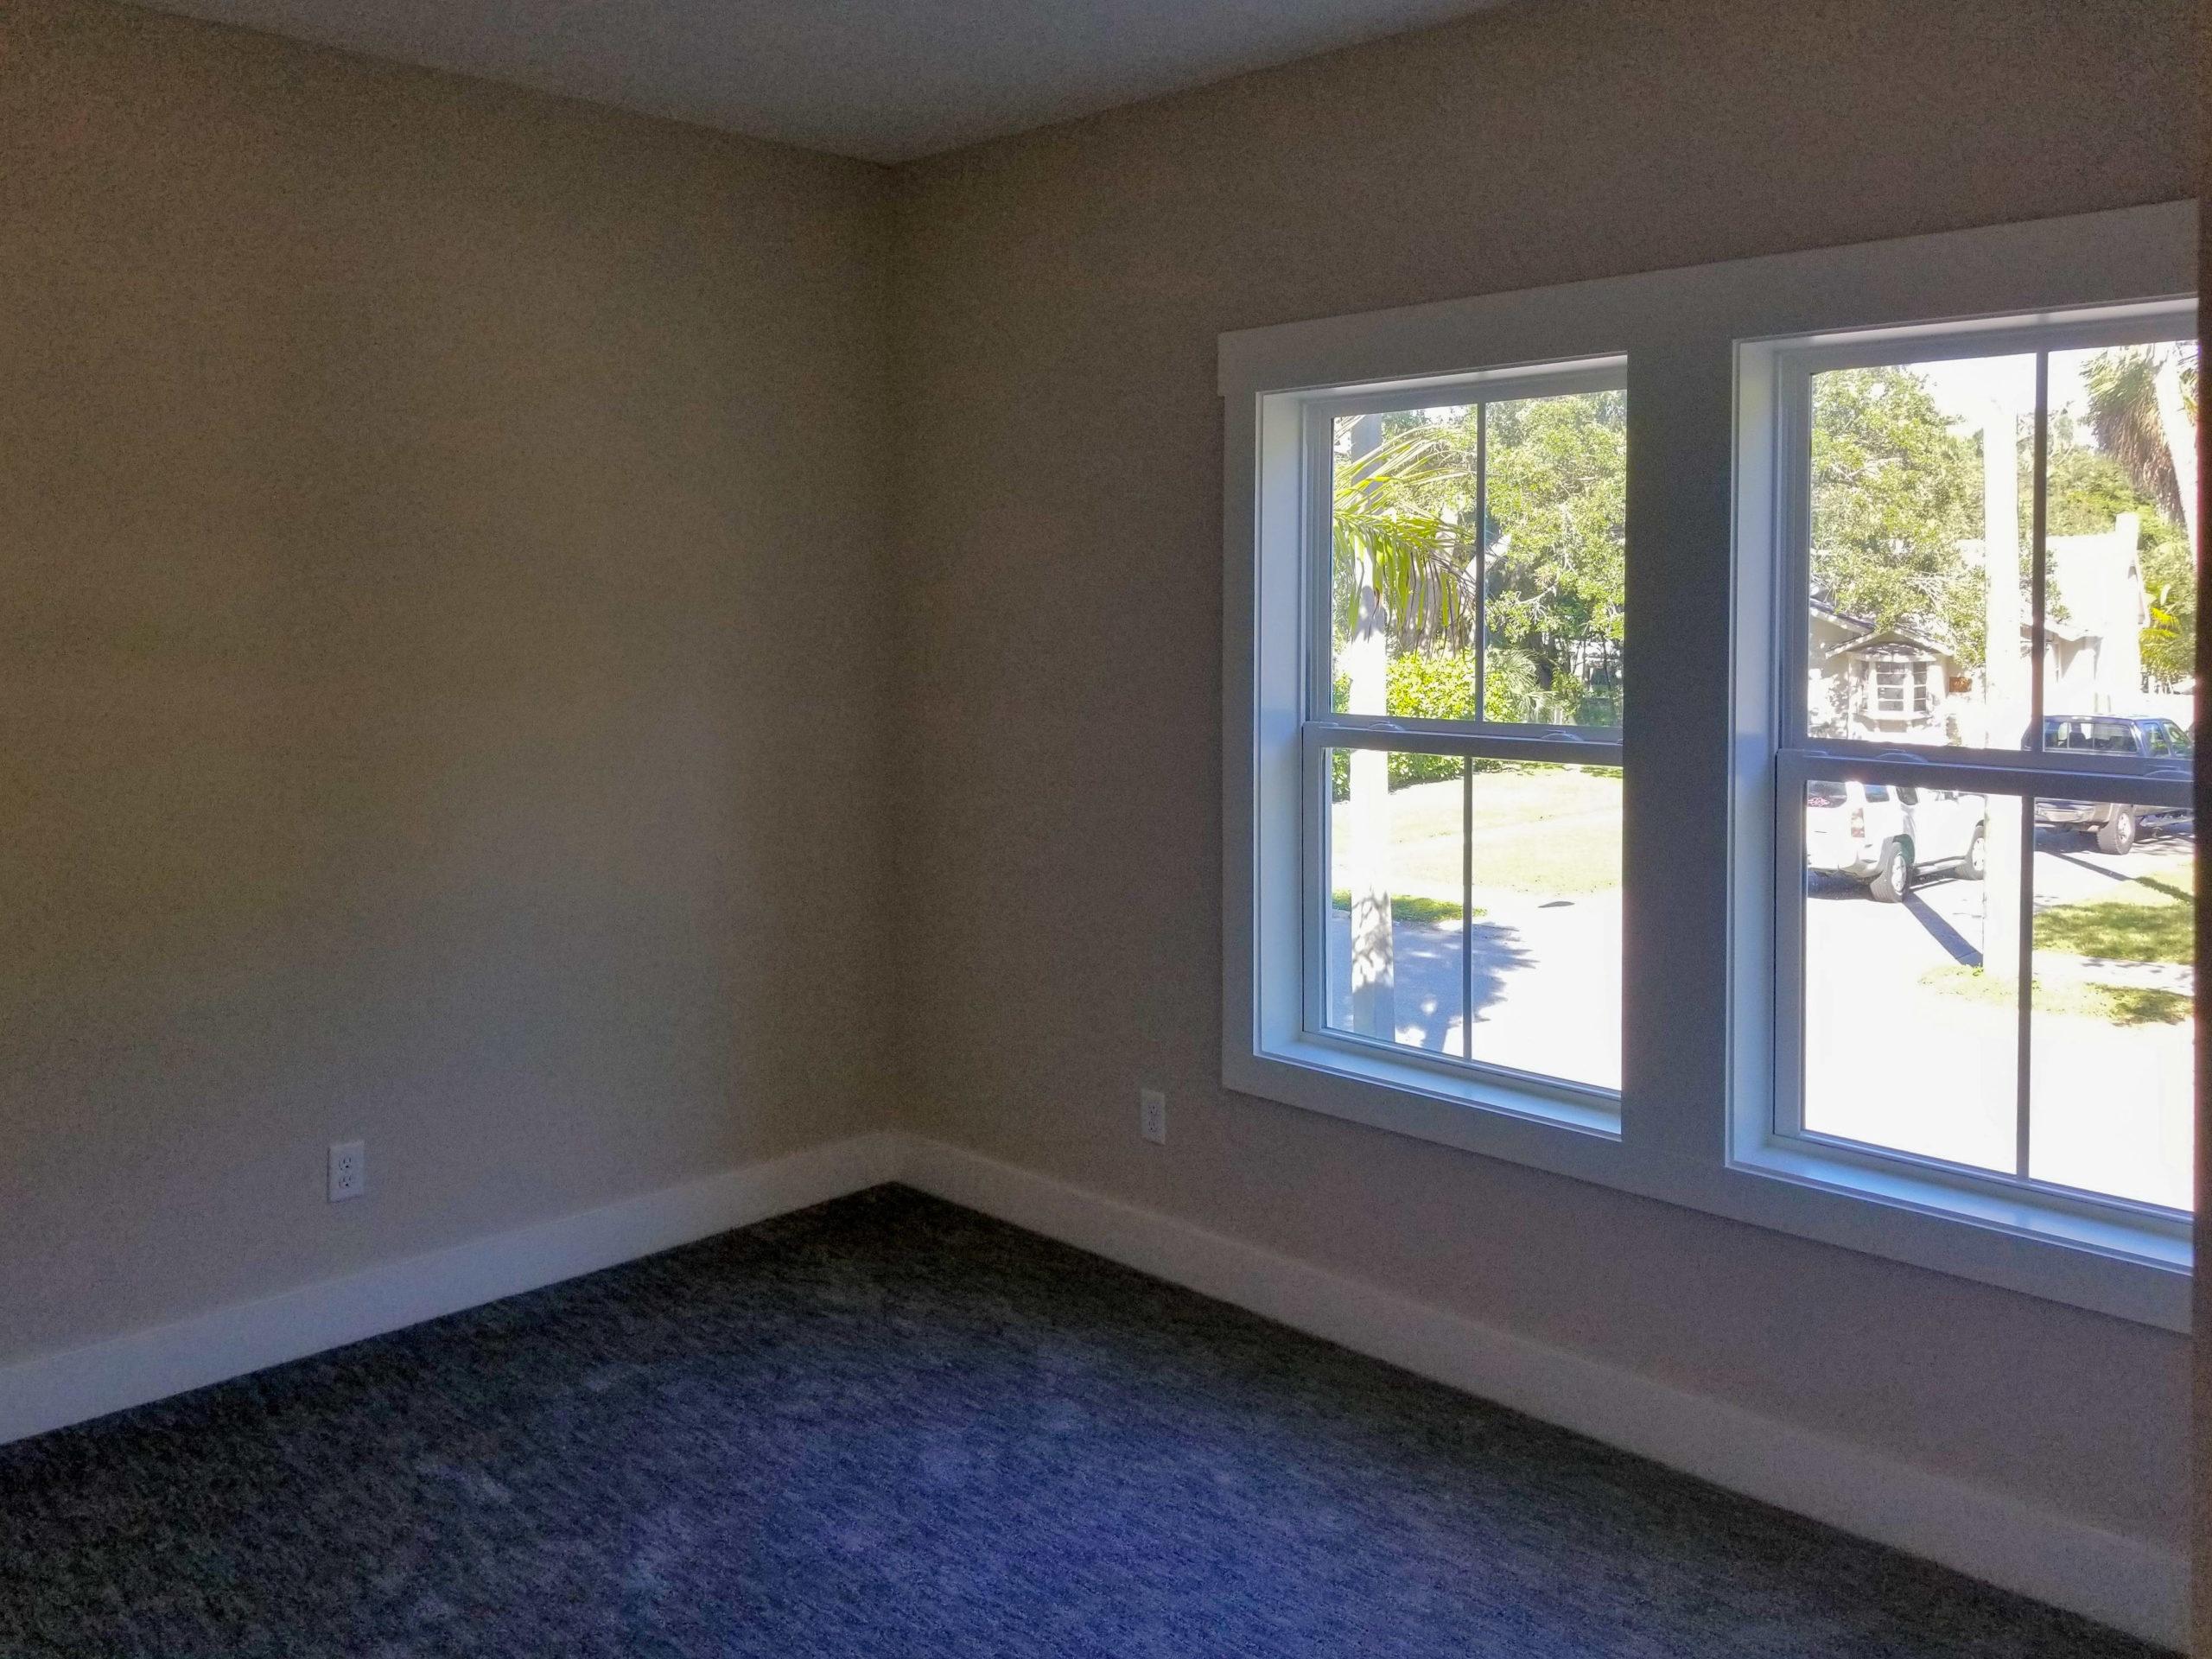 sapelo modular home bedroom window